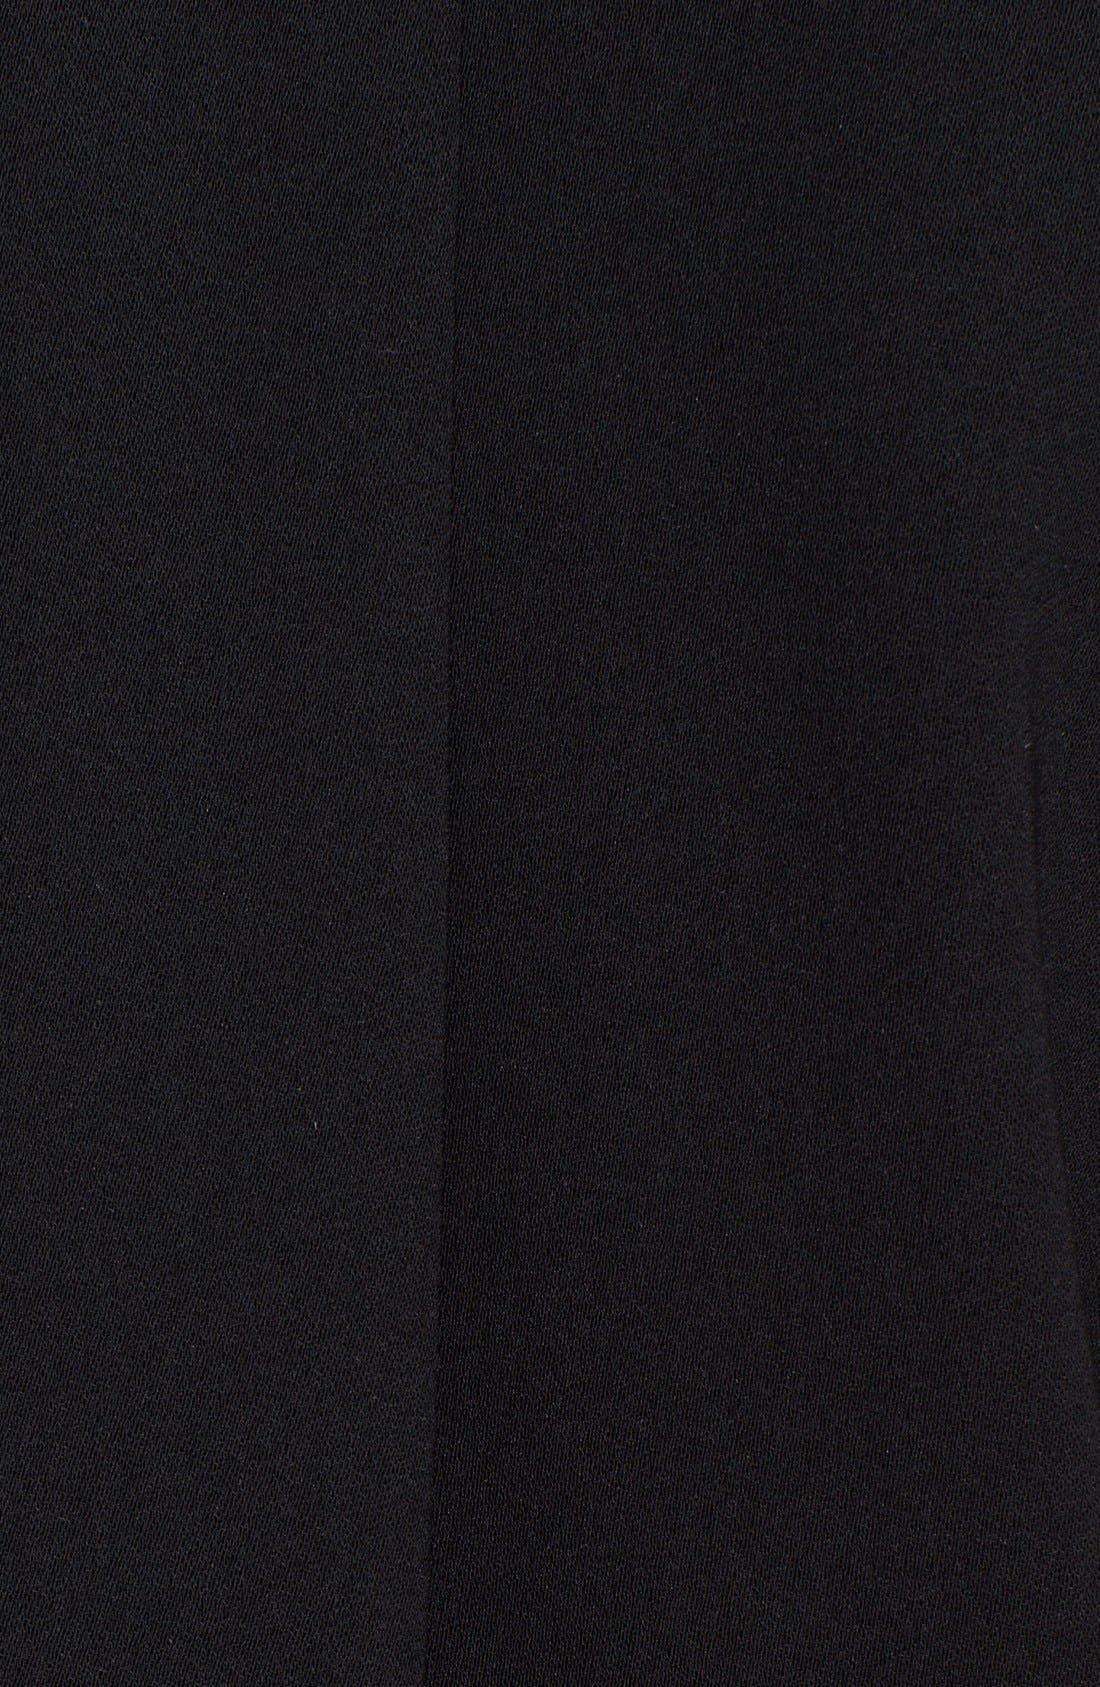 Sleeveless Jumpsuit,                             Alternate thumbnail 3, color,                             001